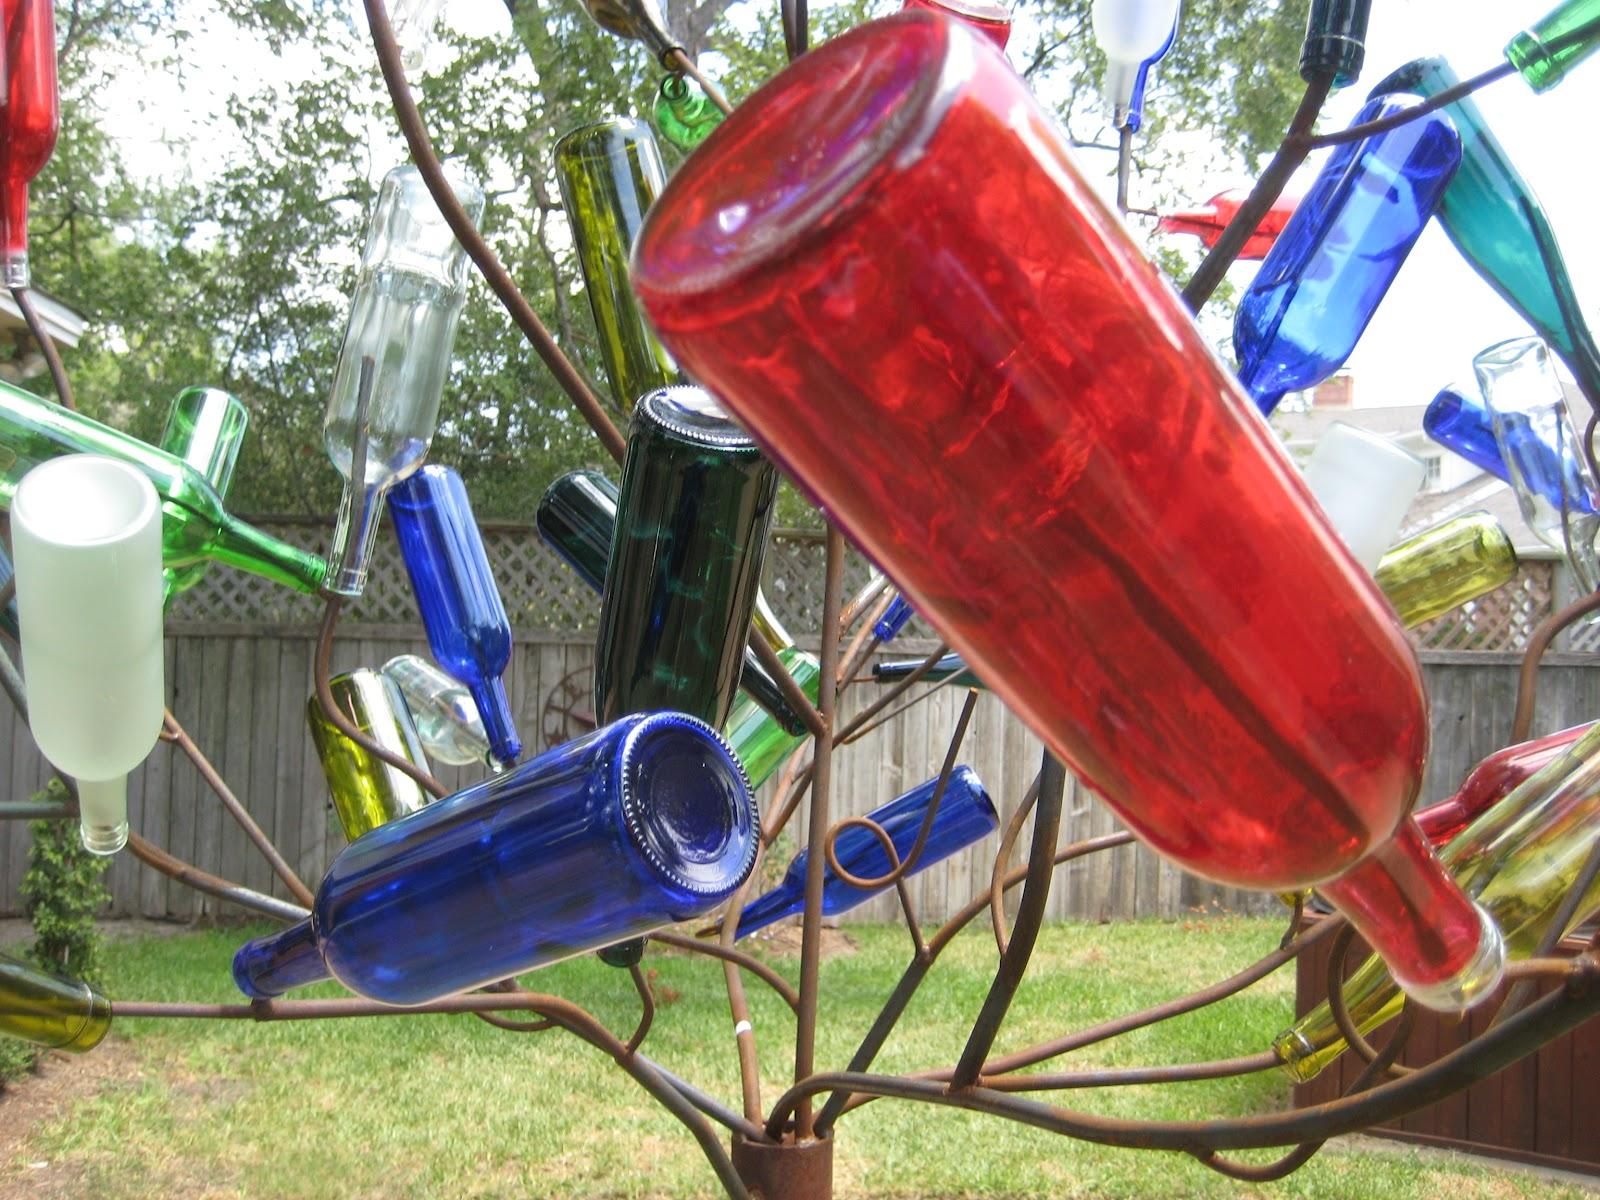 Wine bottle crafts outdoor - Diy Bottle Tree Diy Garden Projects